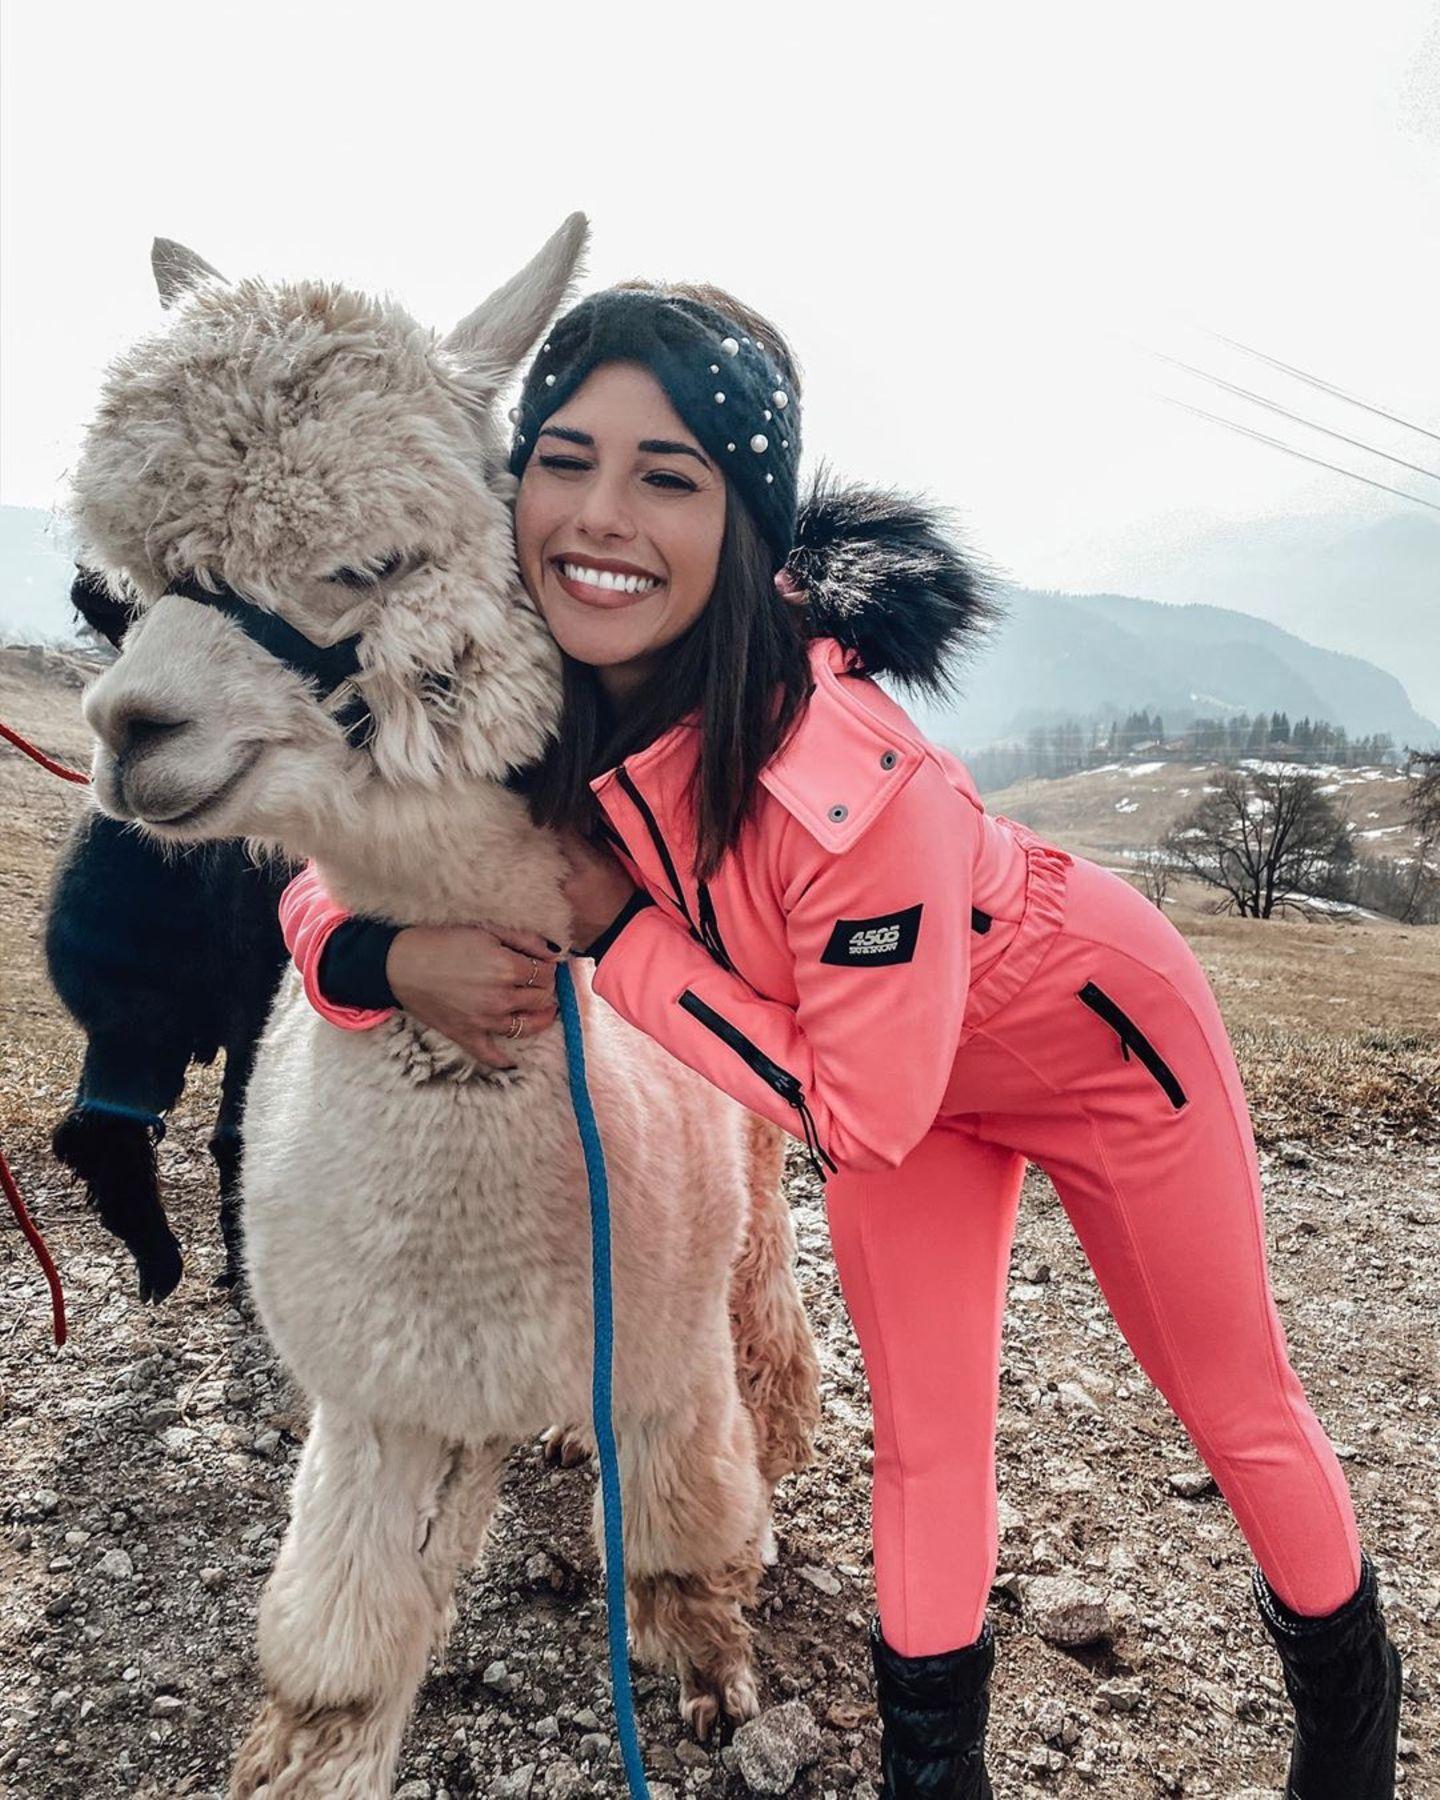 Sarah Lombardi kuschelt mit einem Alpaka